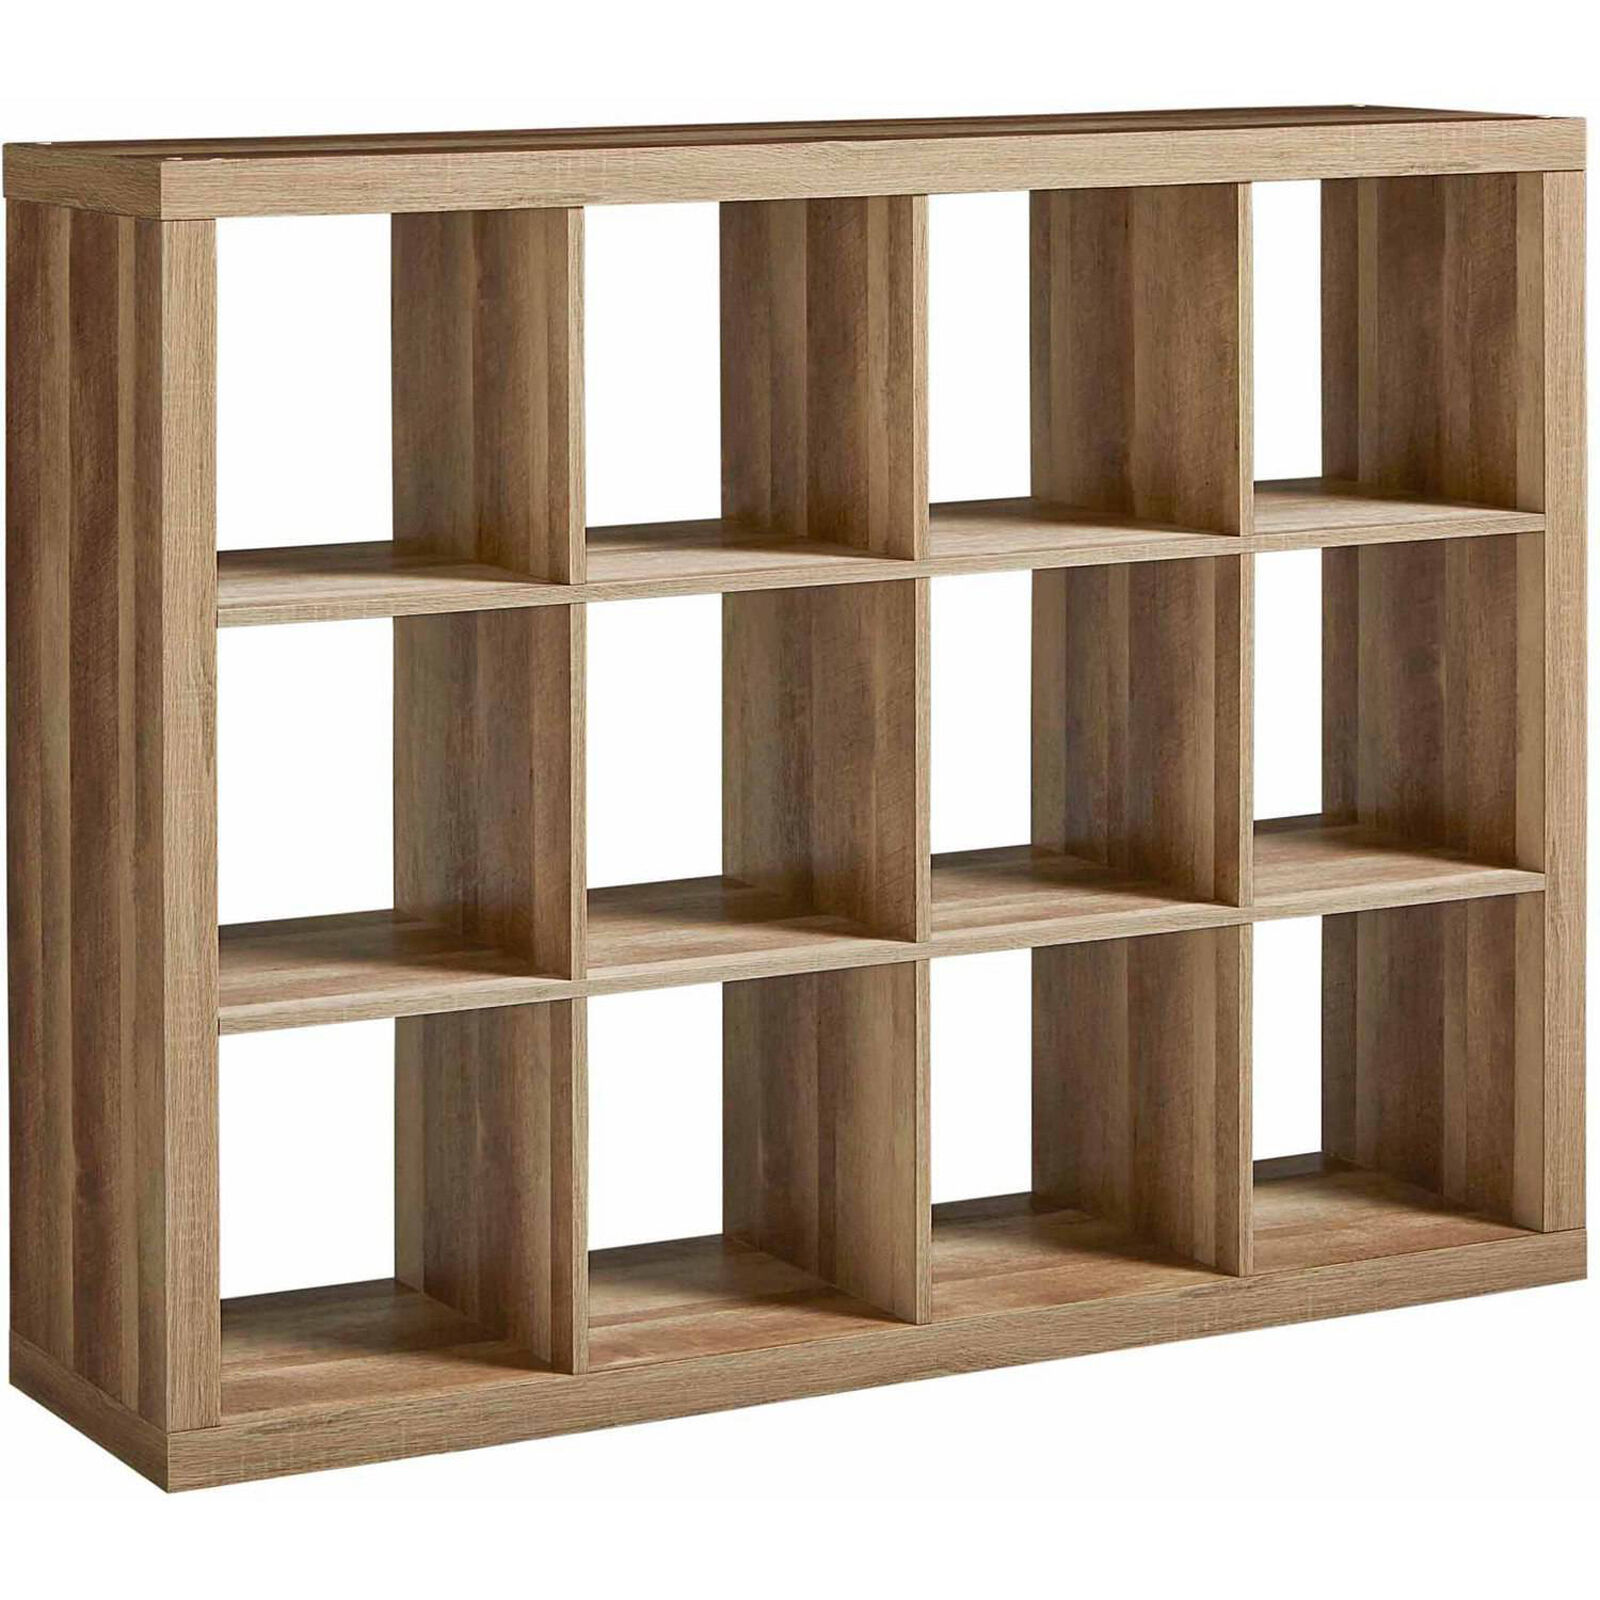 lp storage furniture. LP Records Storage Rack Stand Shelf Crate Album Furniture Vintage Vinyl Cabinet Lp E